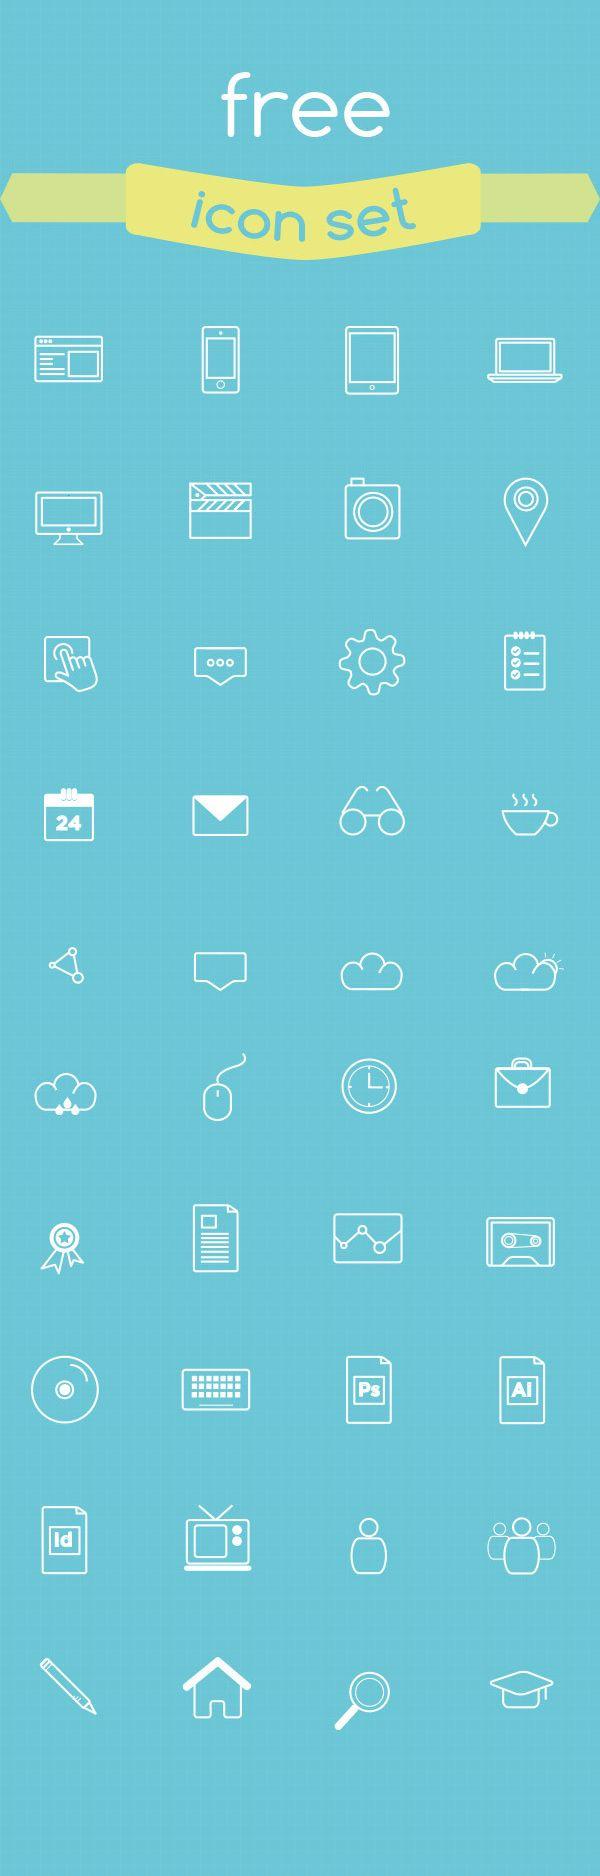 PAGE - Free Icon Set